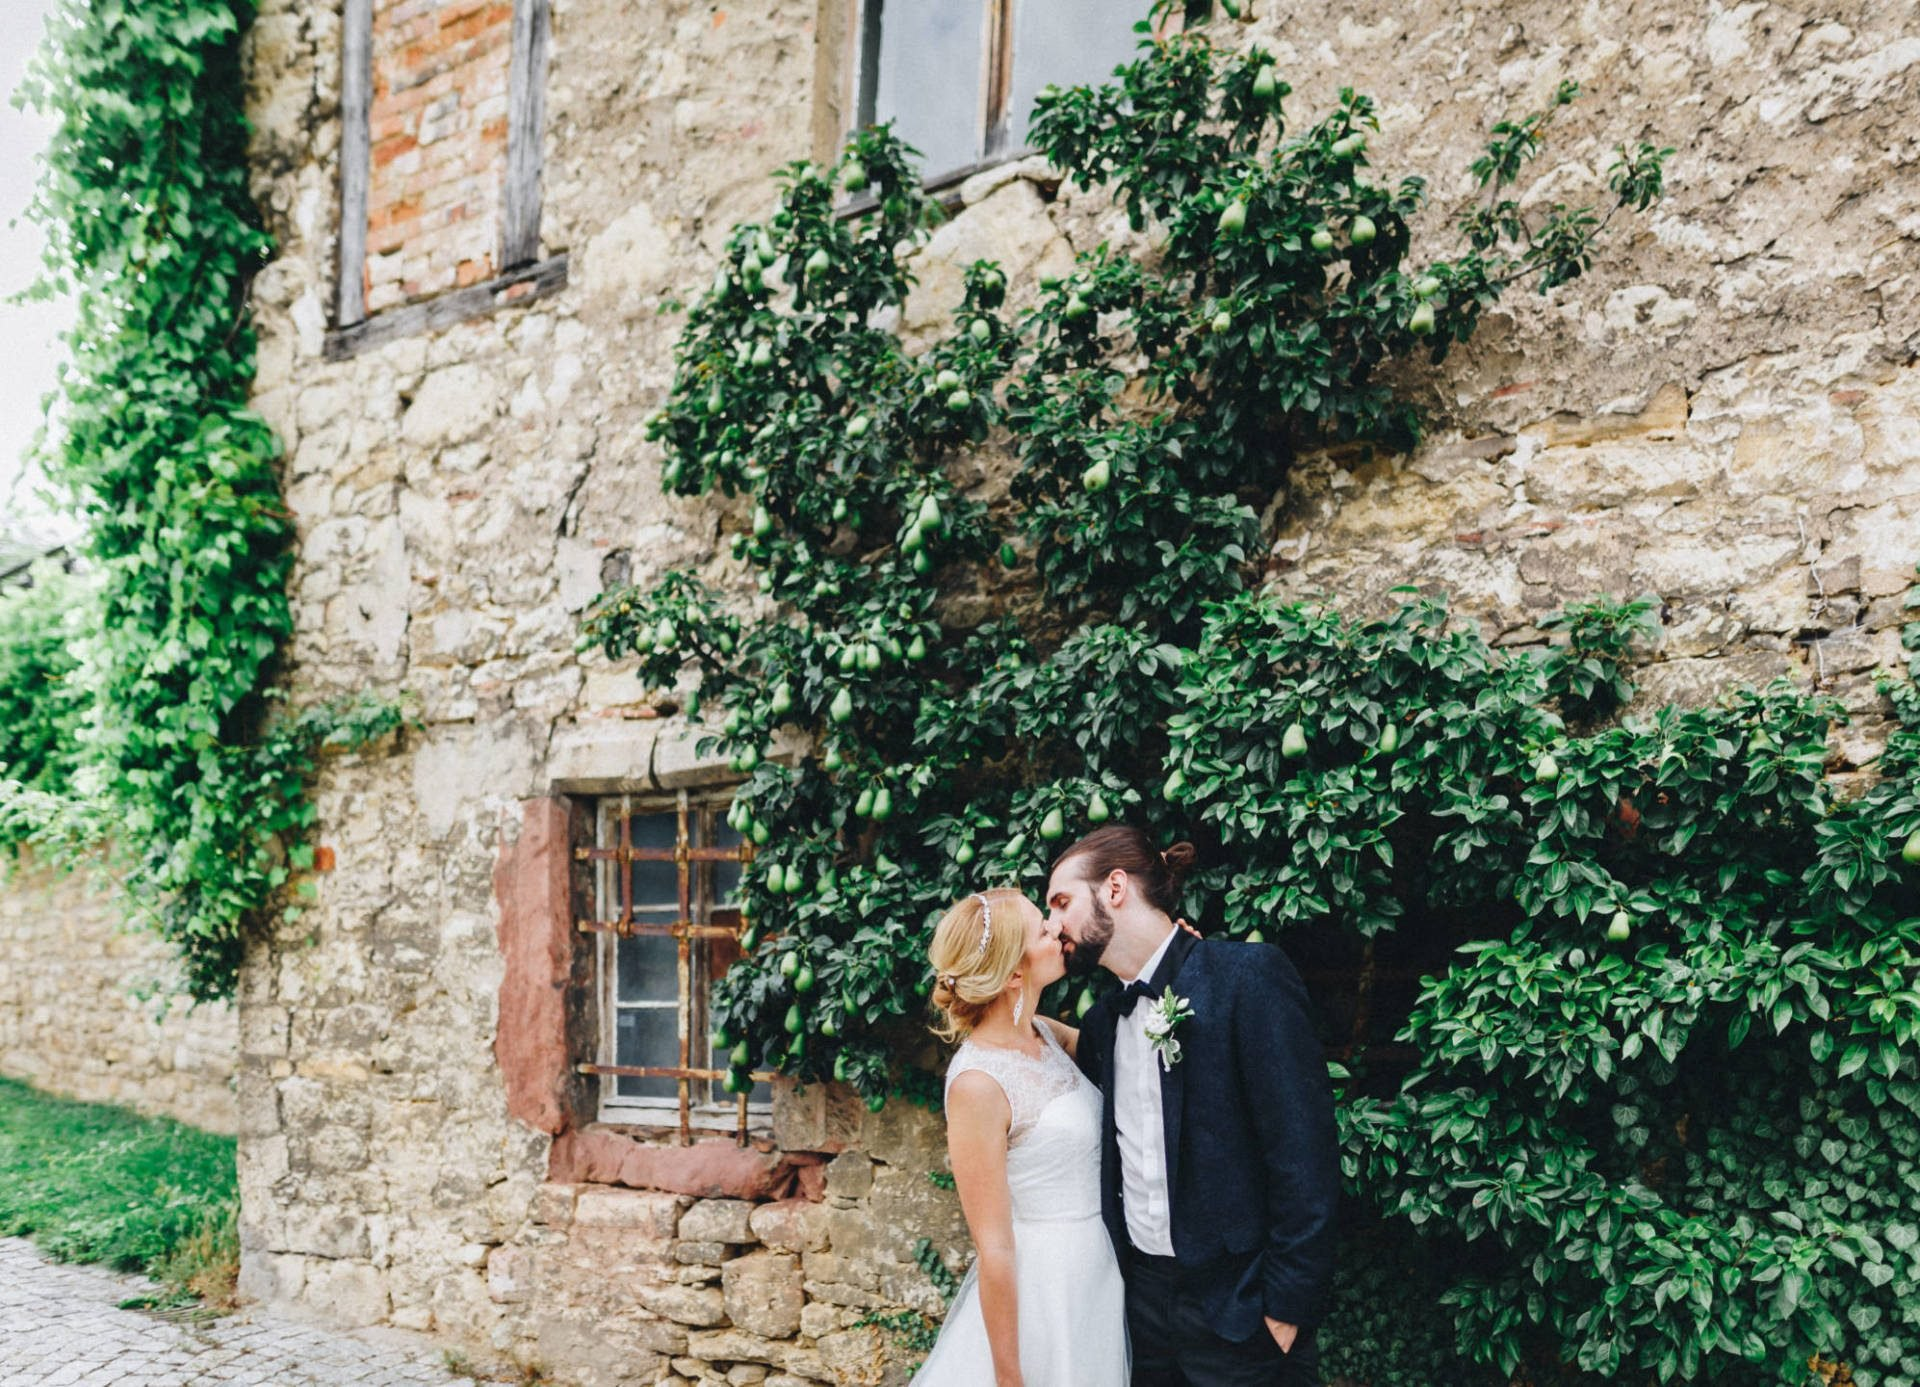 JuleSascha 45 1920x1387 - Hochzeit im alten Dornburger Schloss